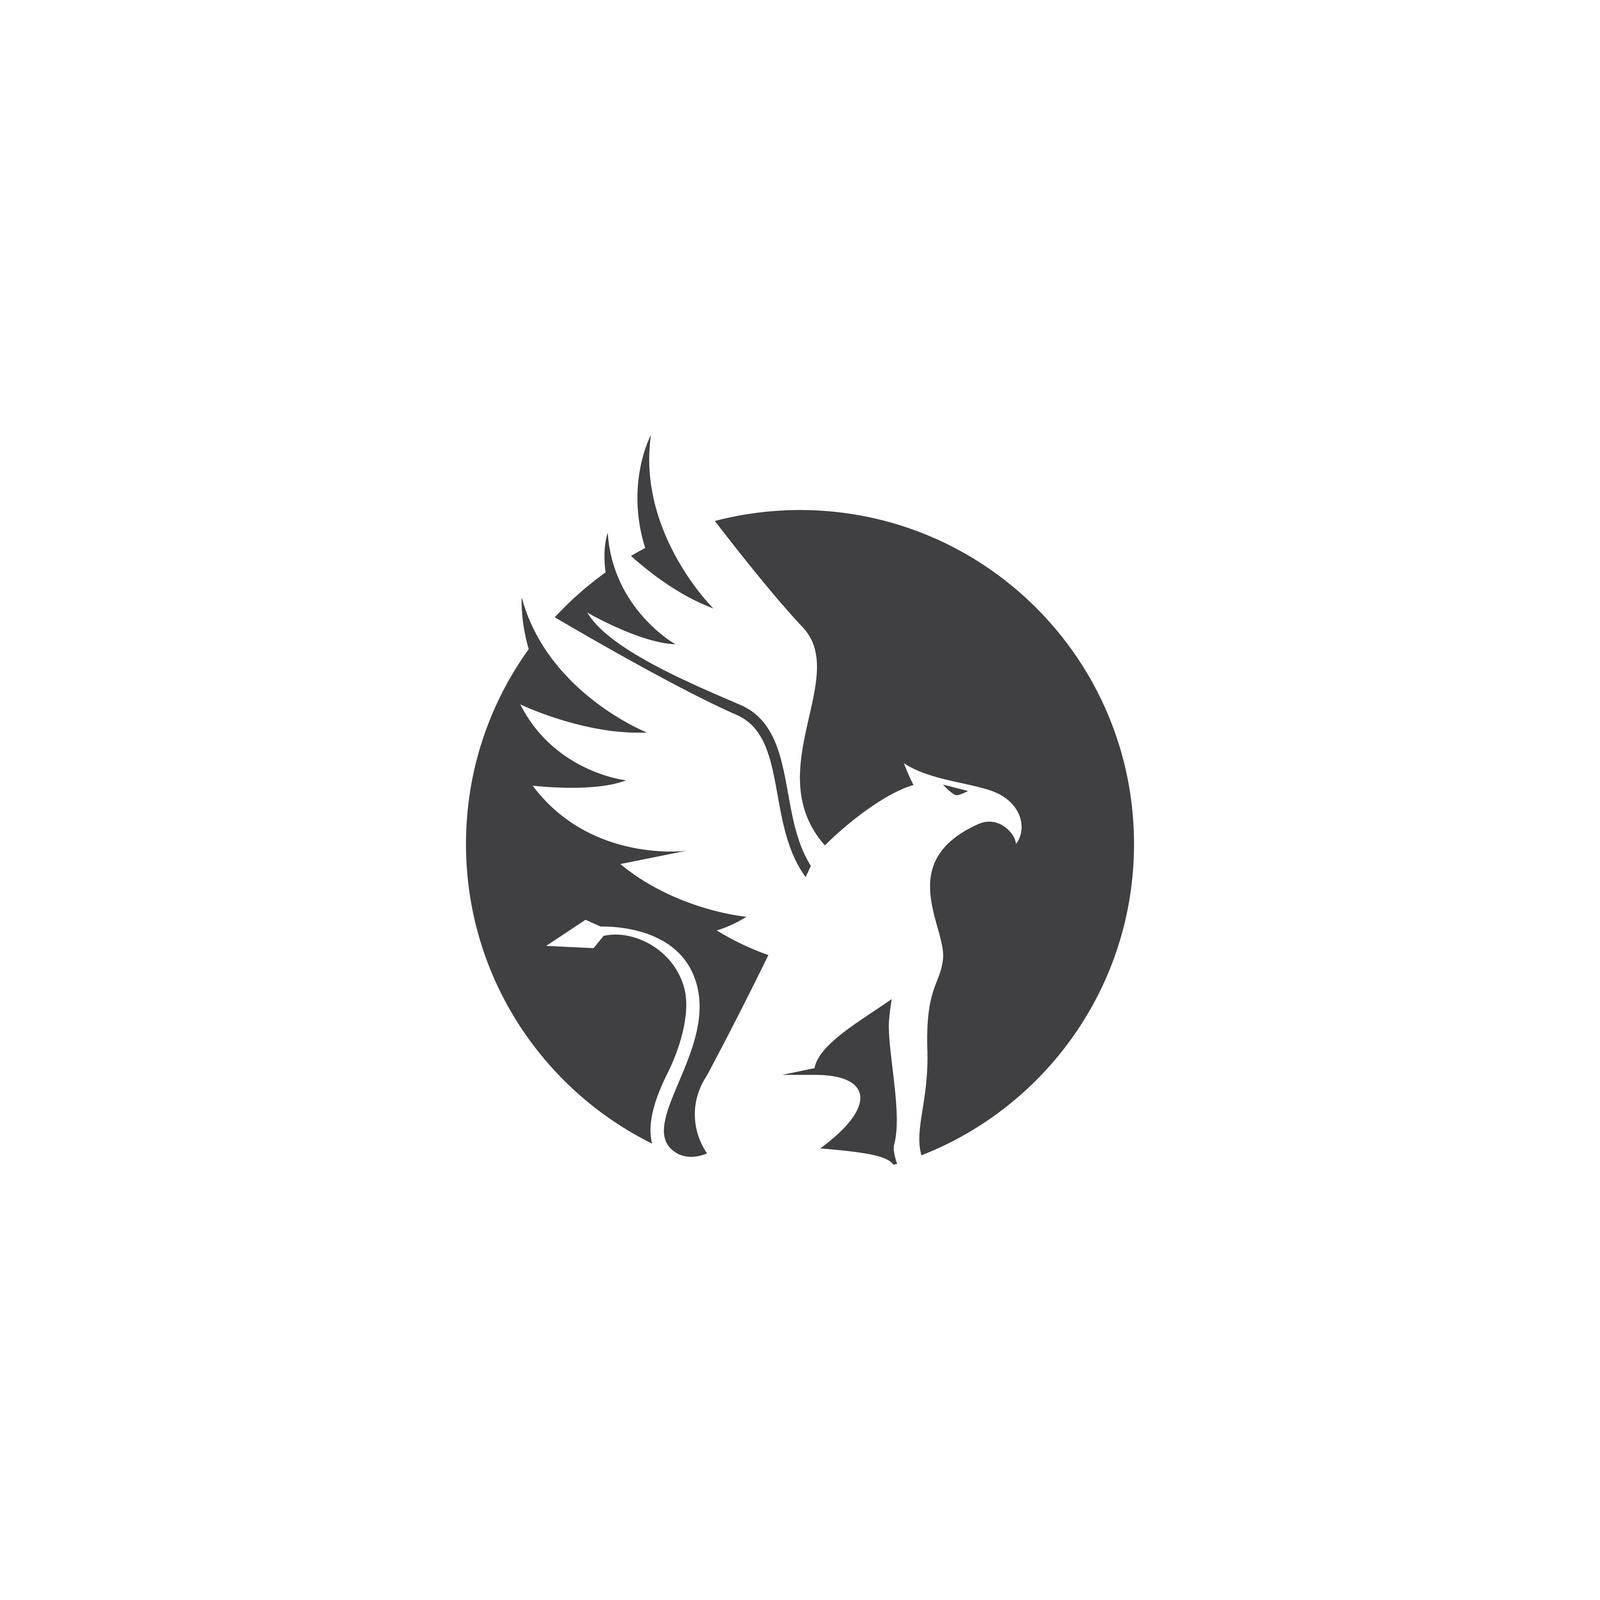 Griffin logo illustration vector design